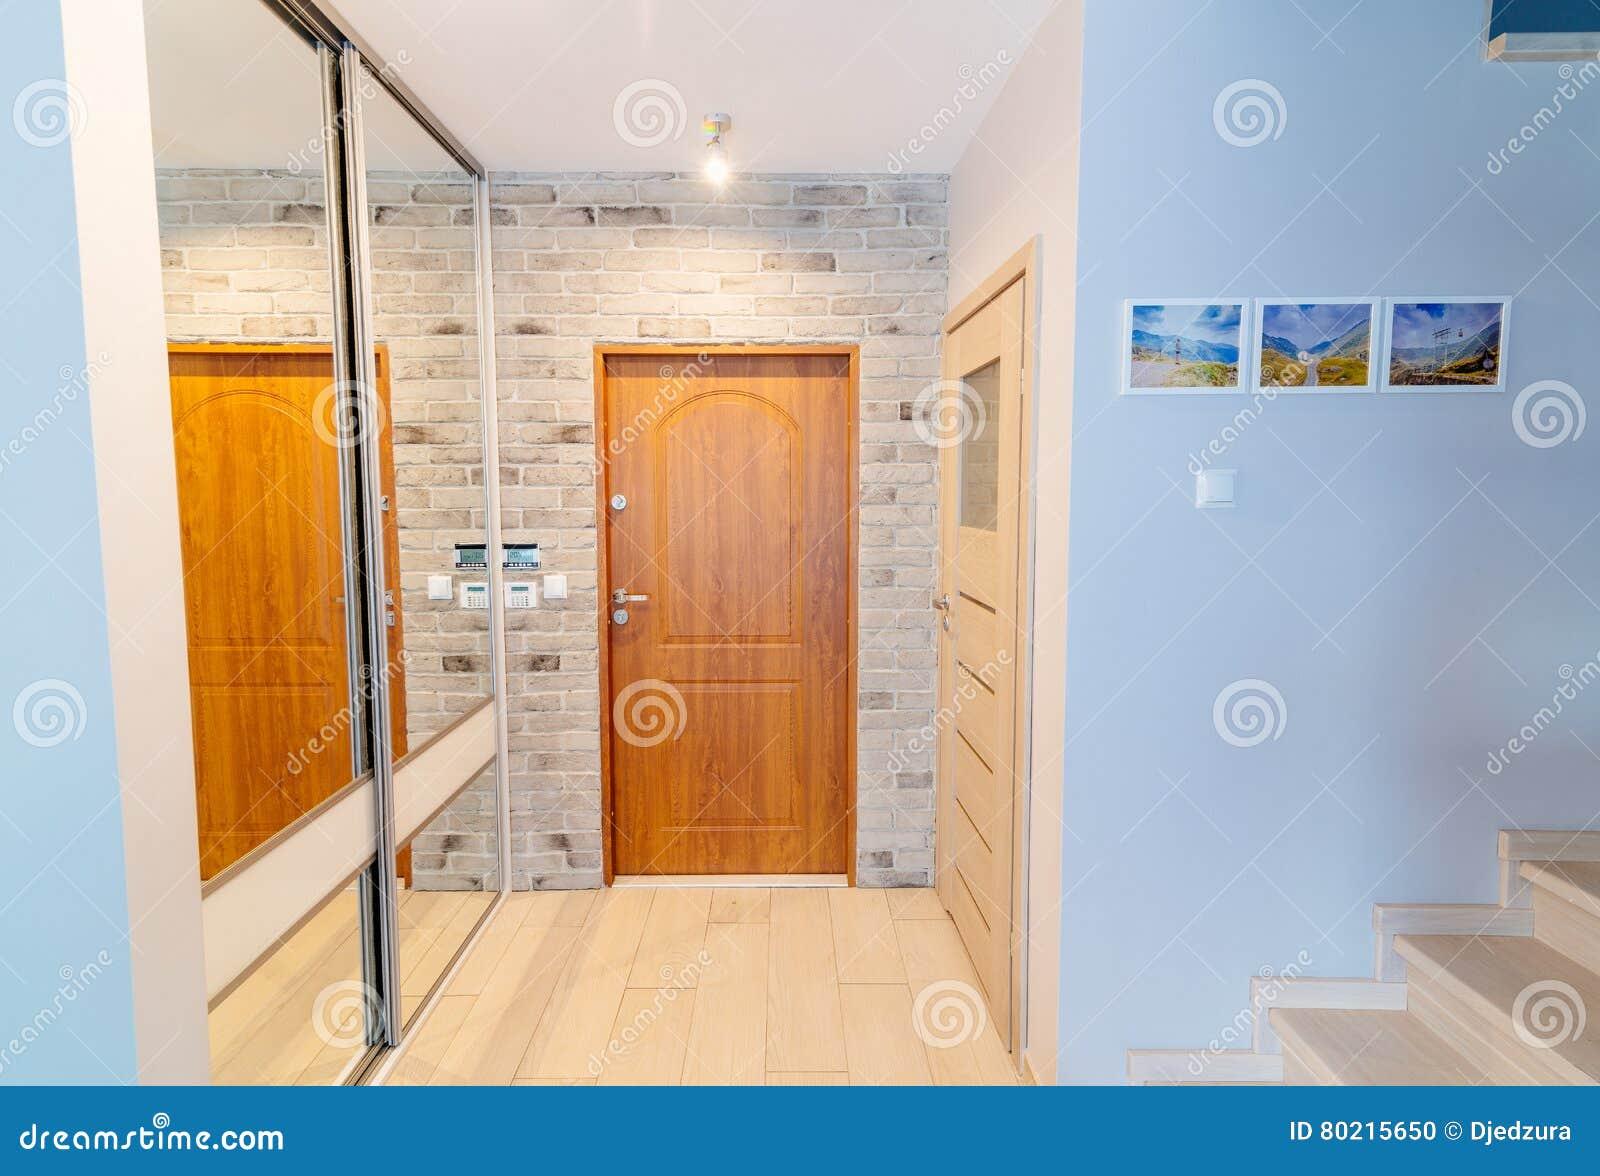 Best garde robe d entr e photos - Appartement hal ...